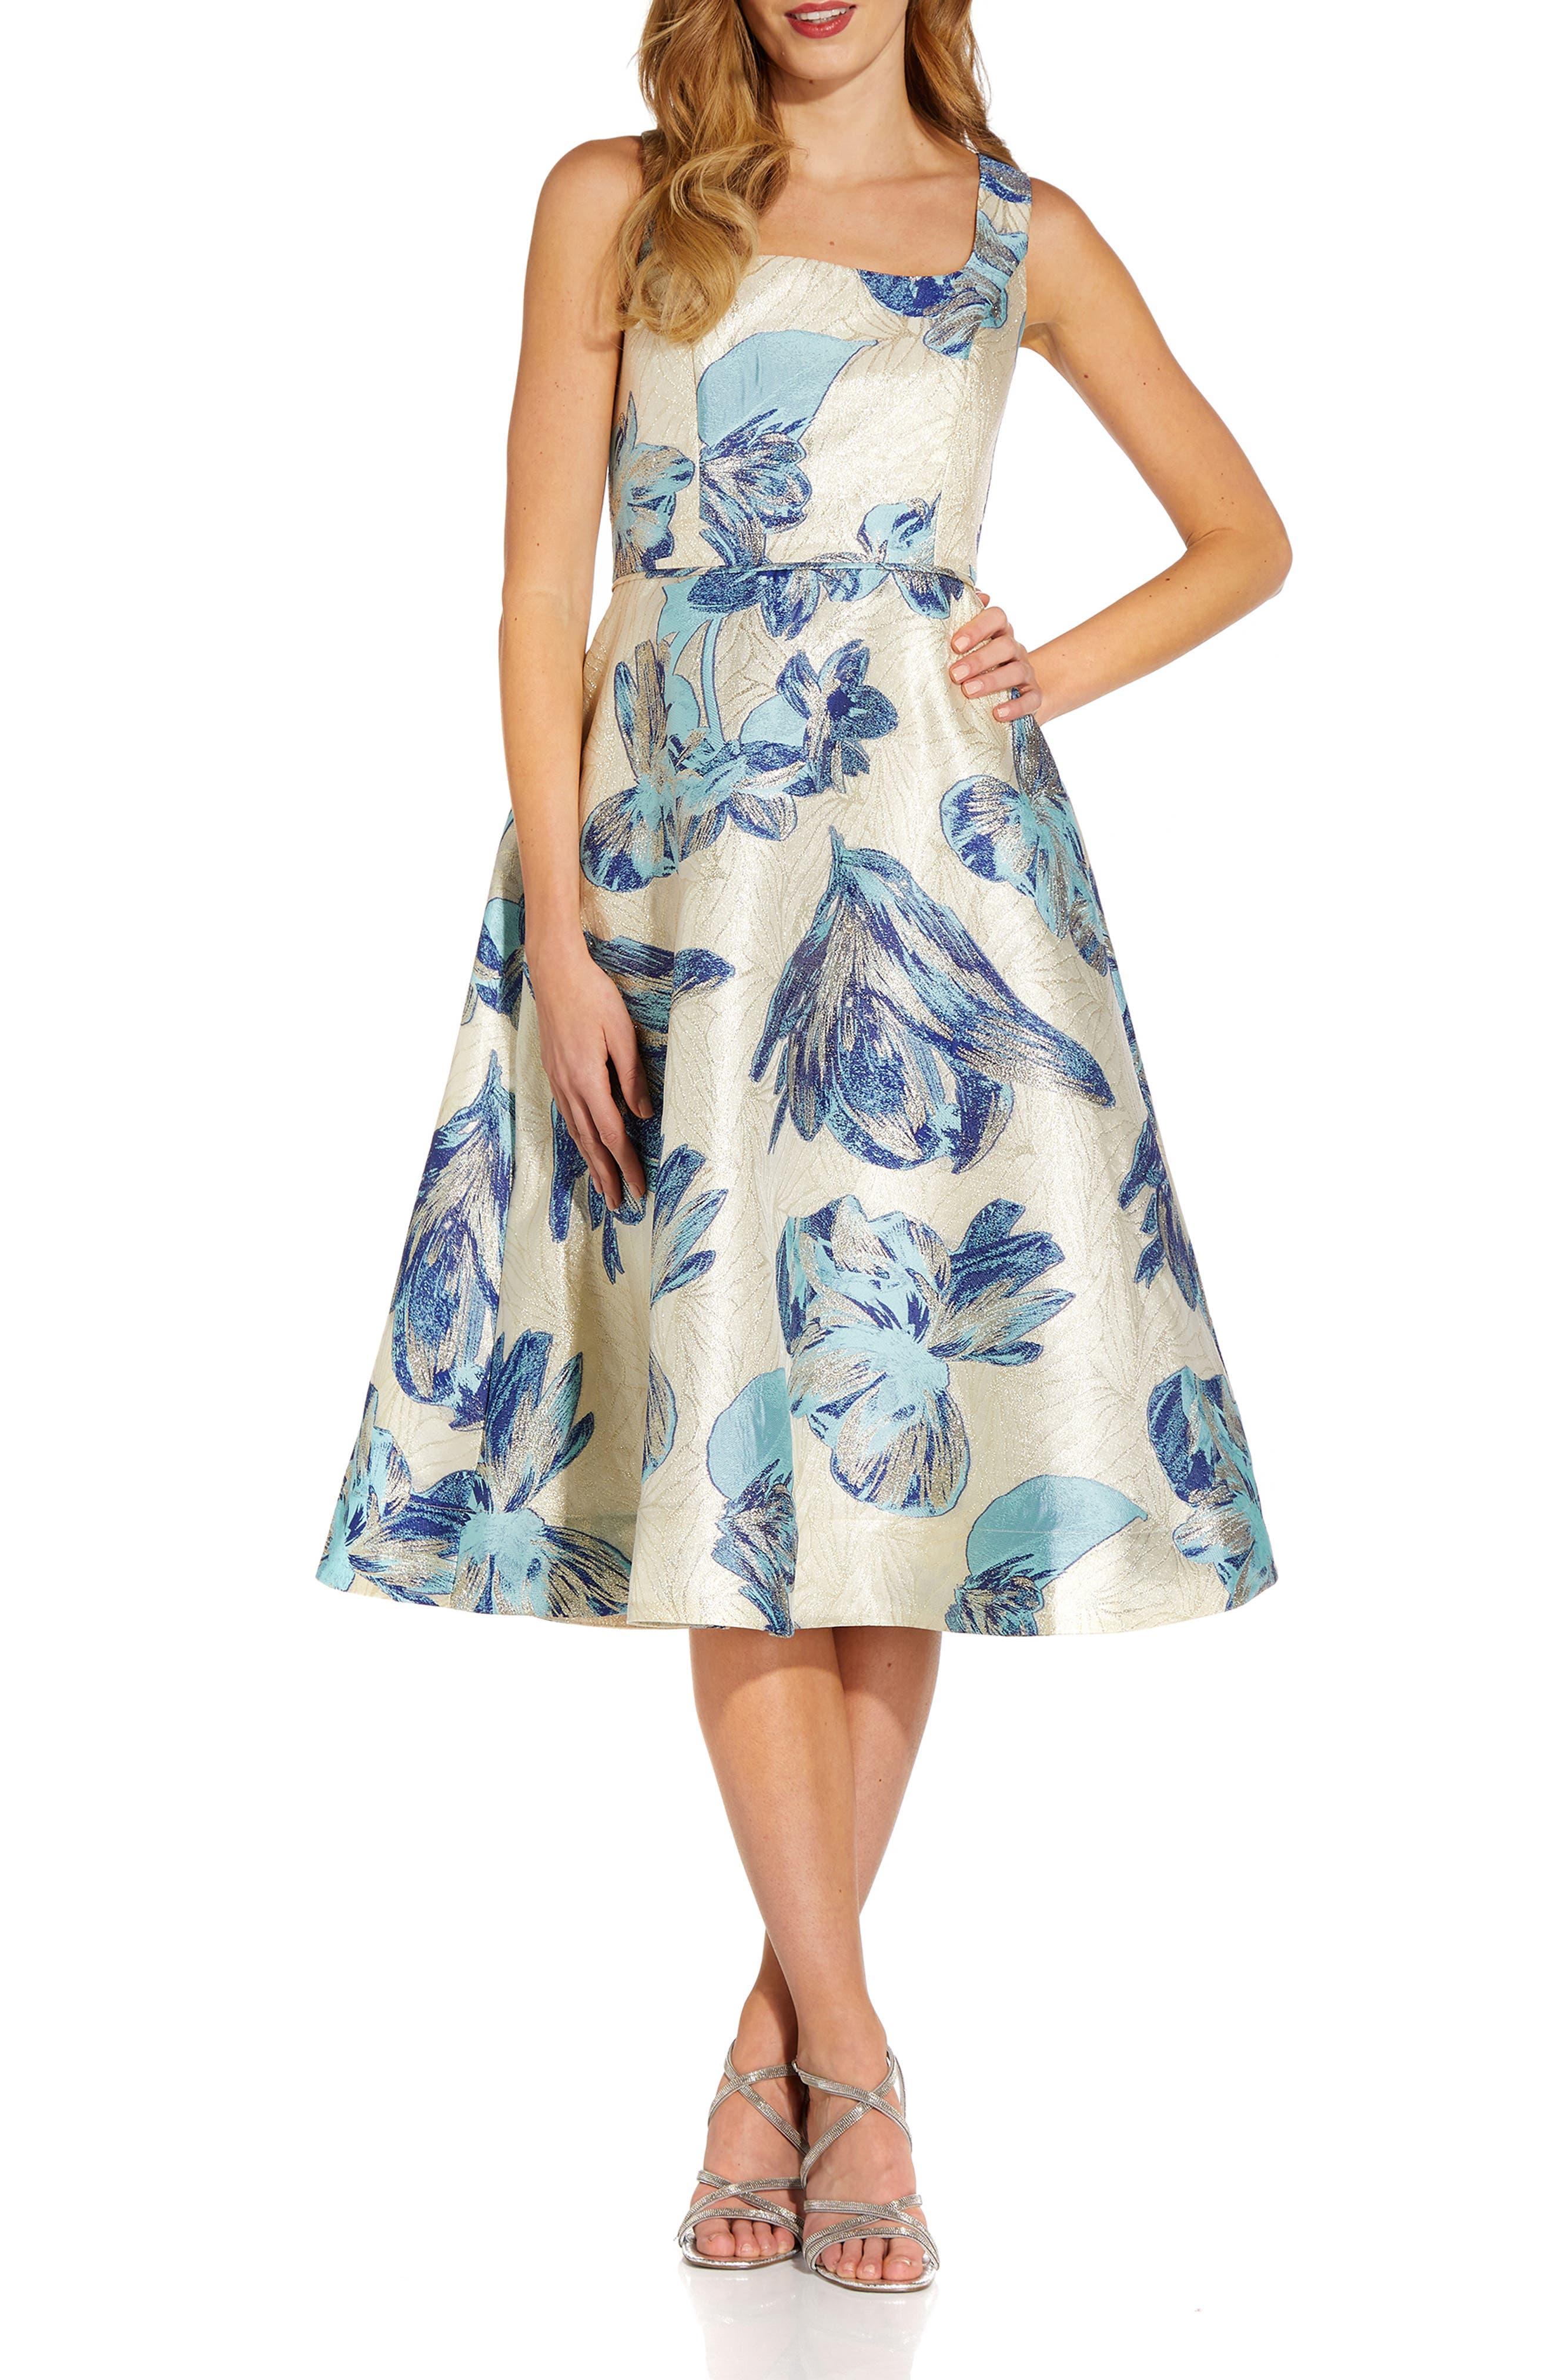 Metallic Floral Jacquard Sleeveless Fit & Flare Cocktail Midi Dress